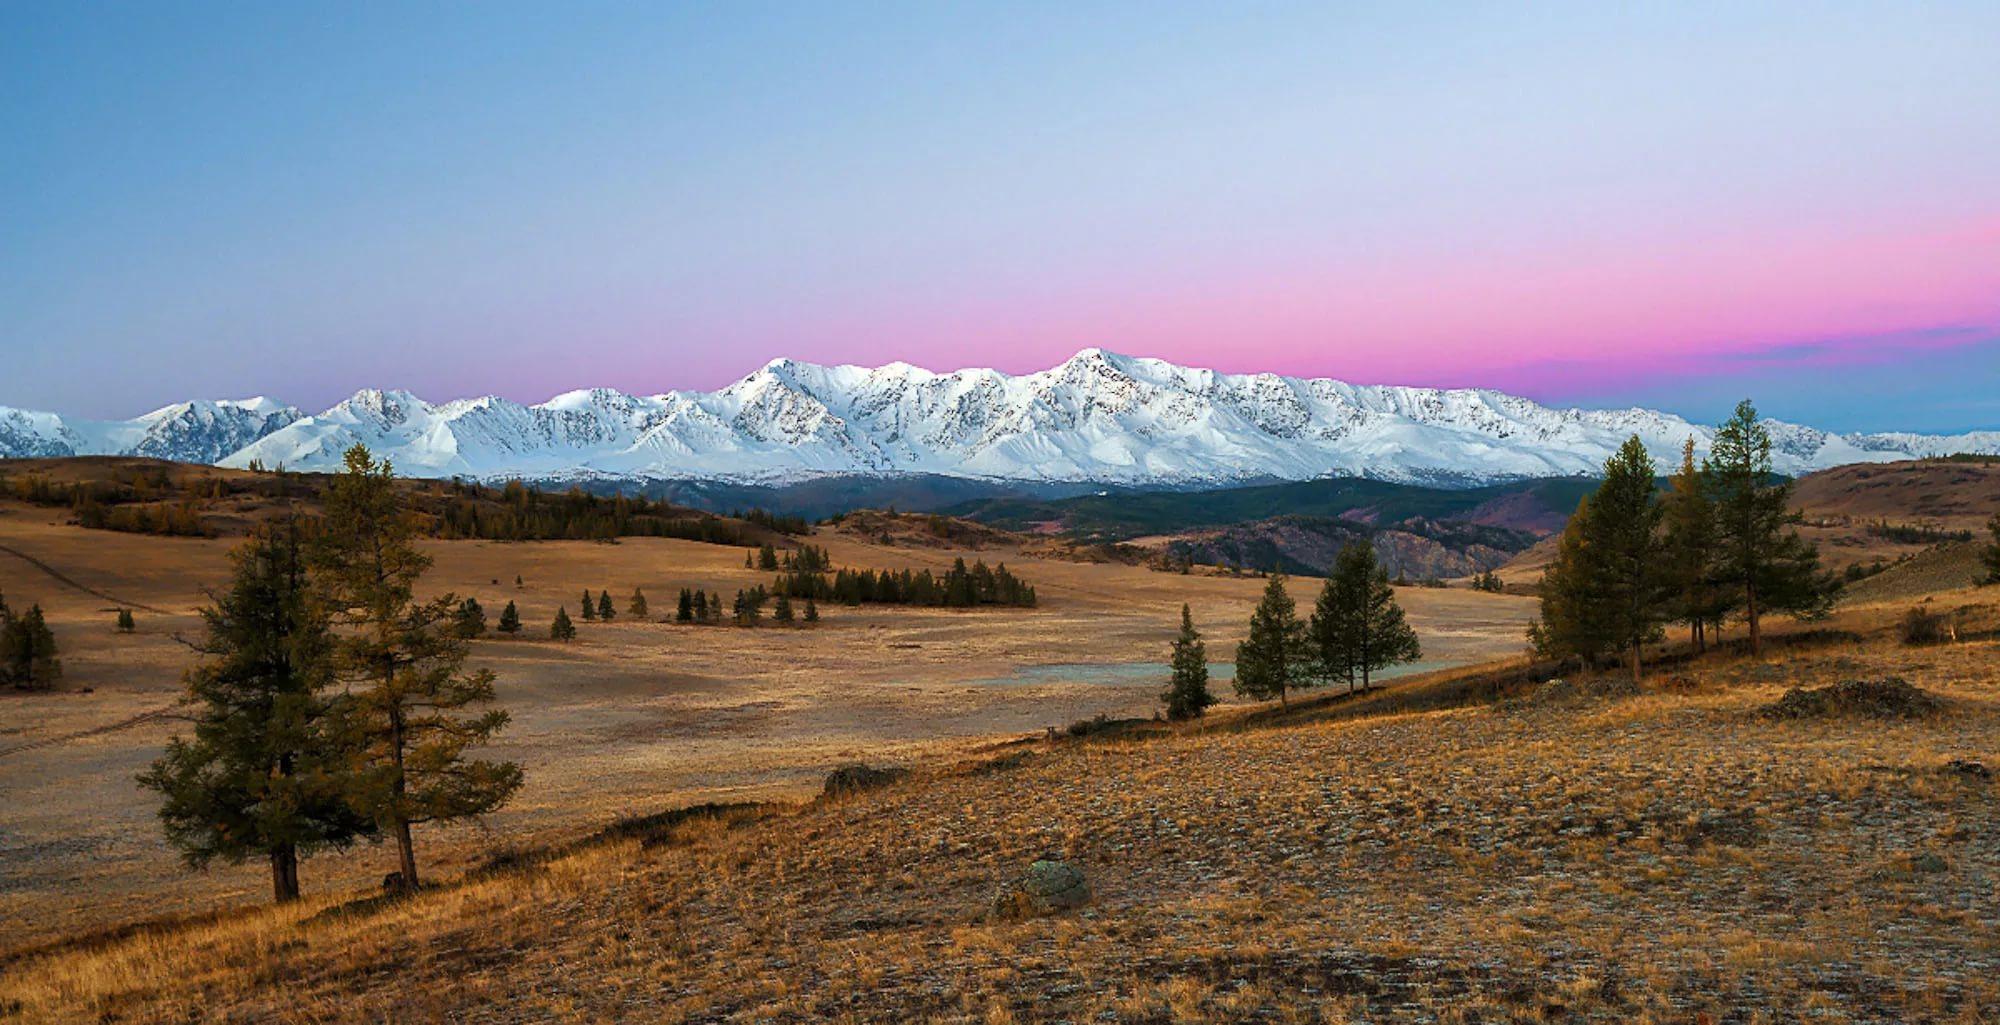 30 - 10 locais no Altay que vale a pena visitar